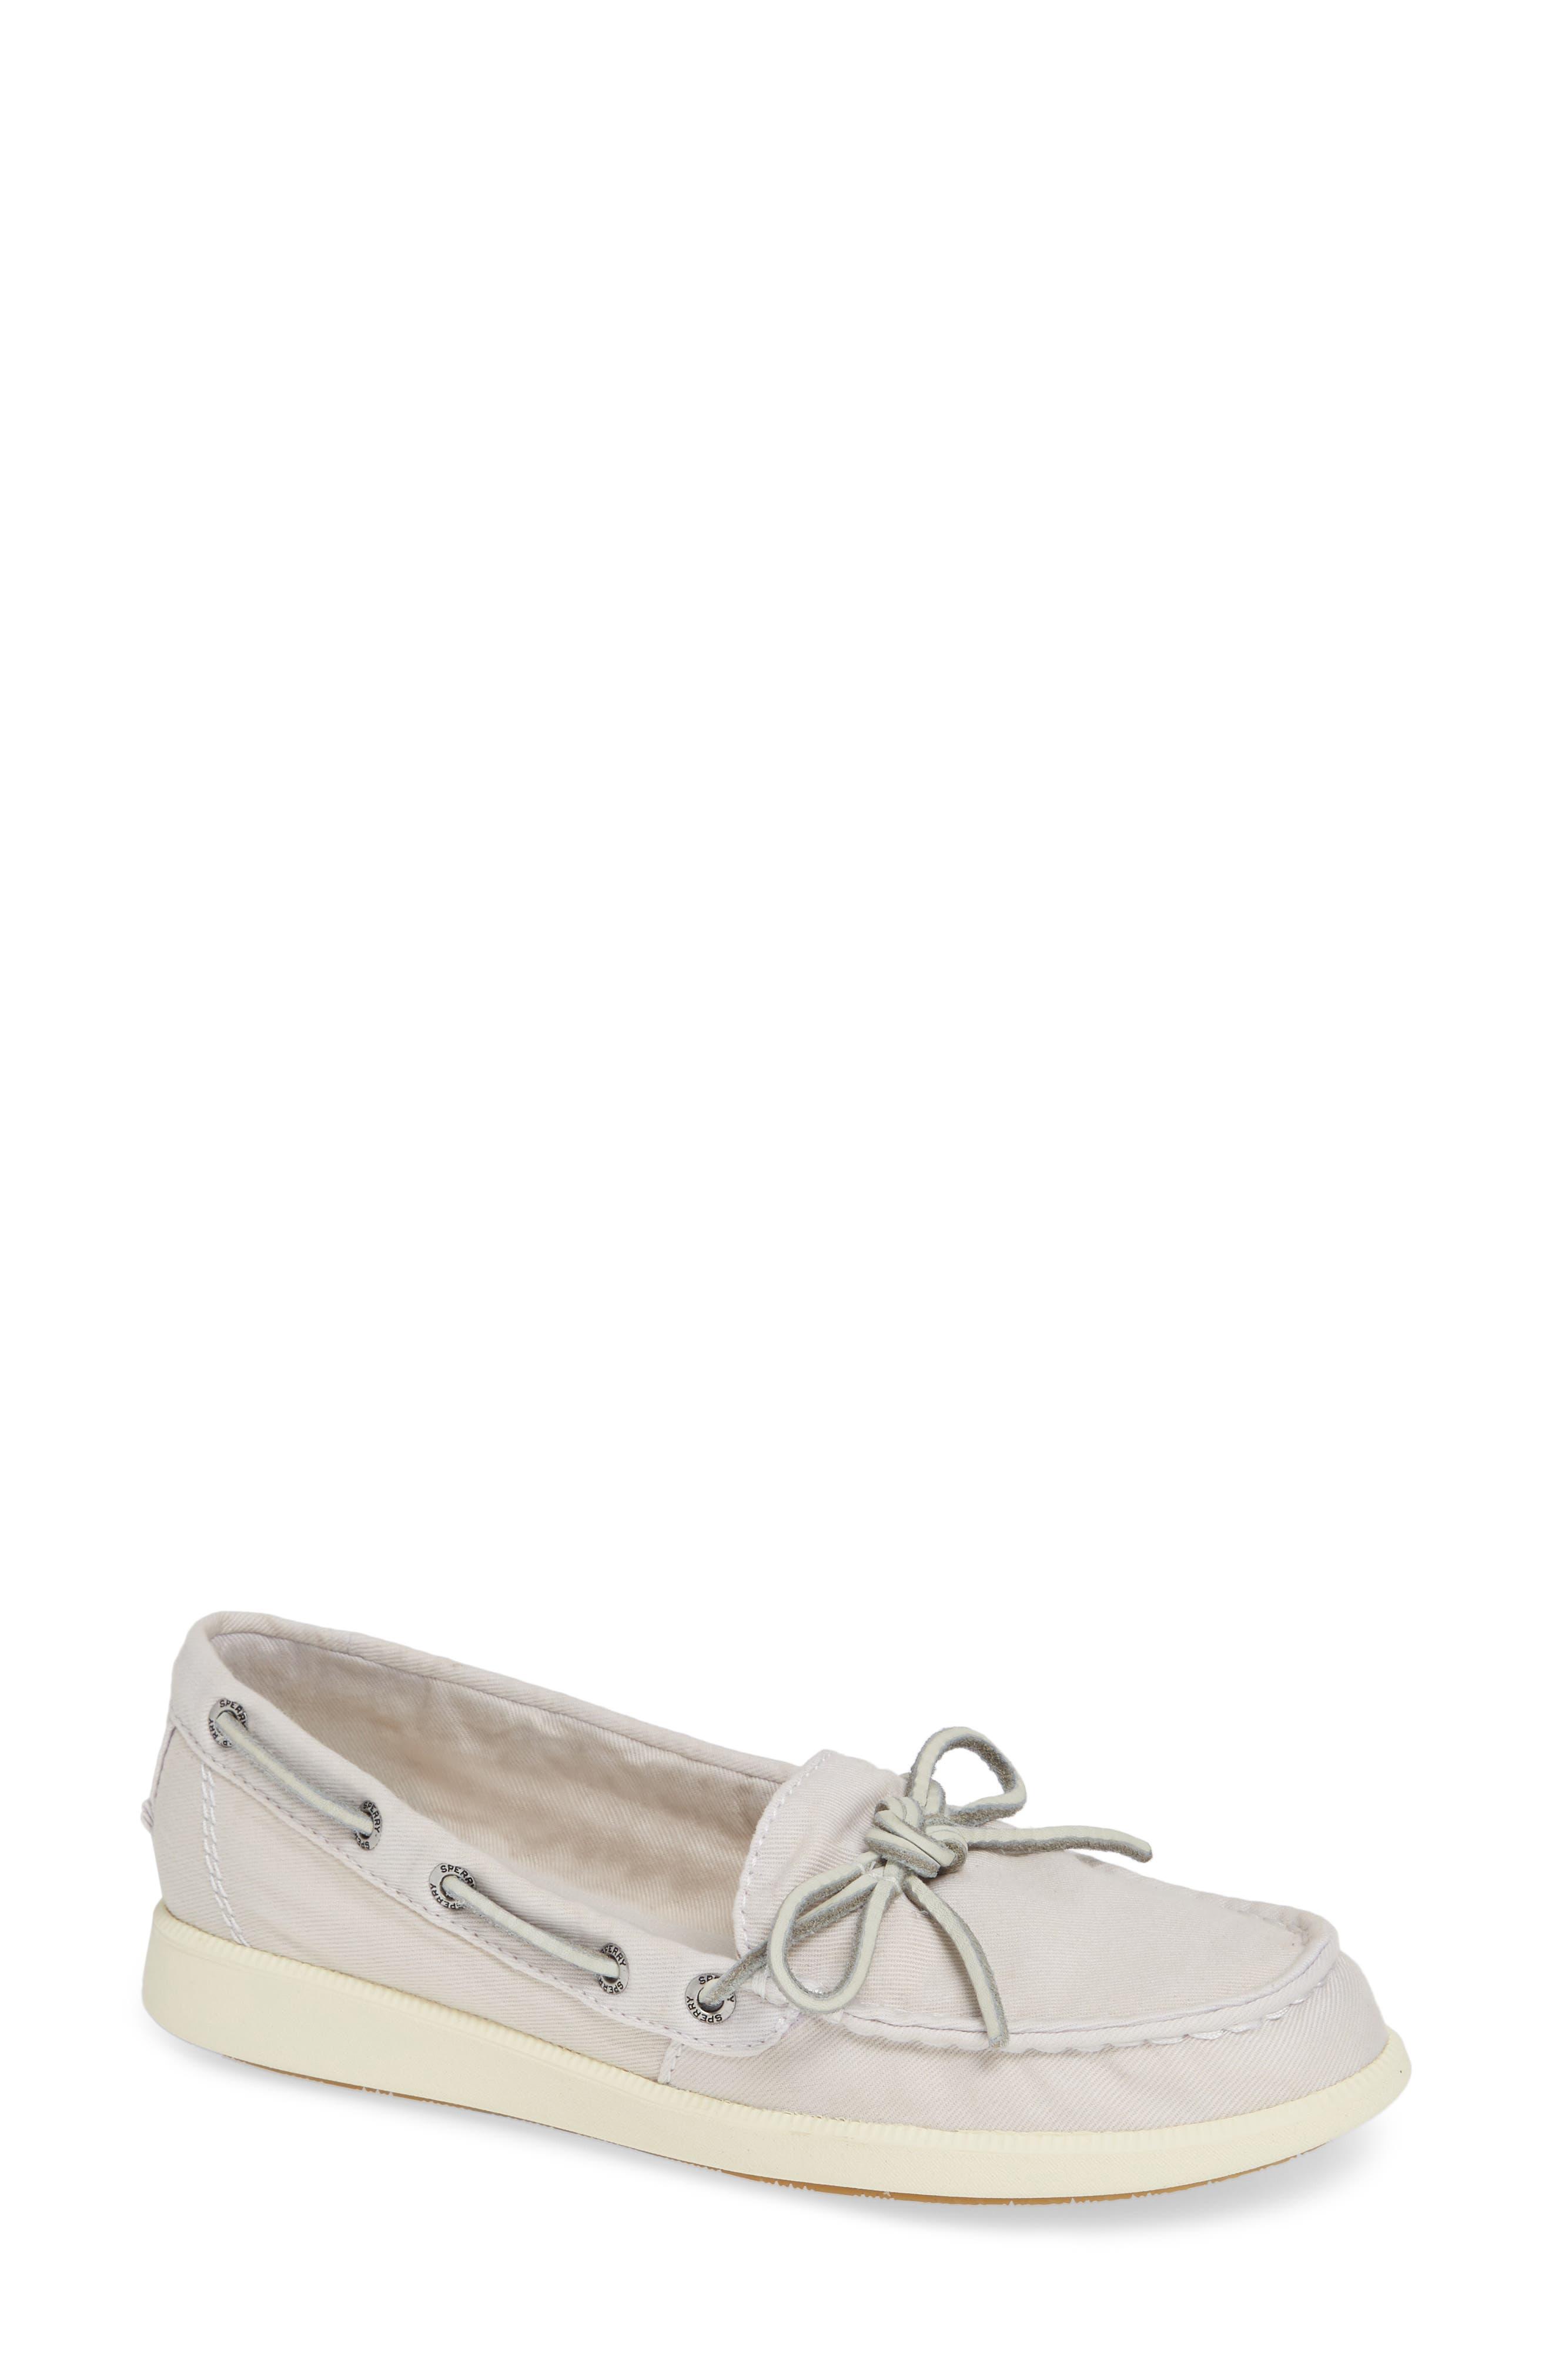 Oasis Boat Shoe,                             Main thumbnail 1, color,                             Ivory Canvas